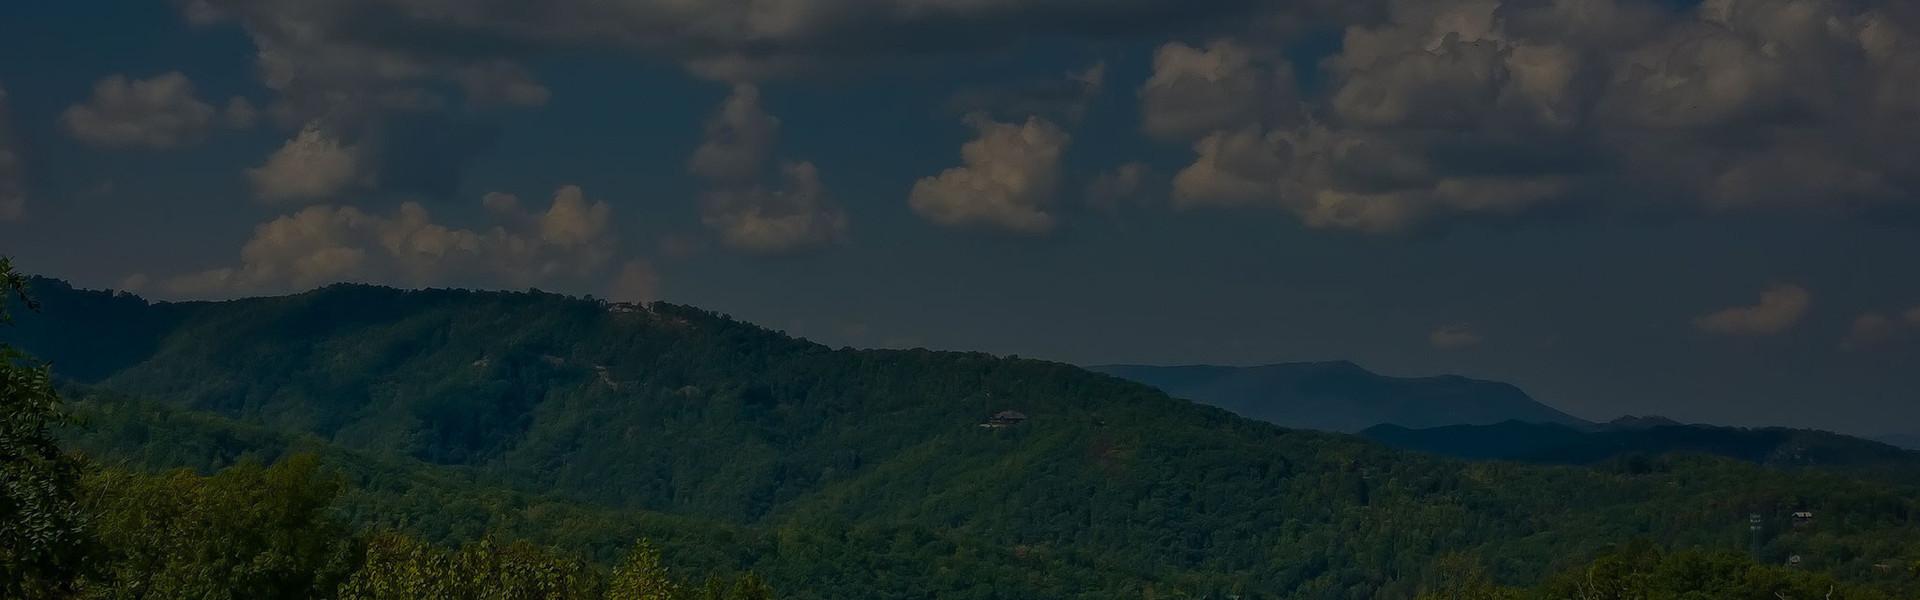 Gatlinburg Resort near the Smoky Mountains | Smoky Mountains